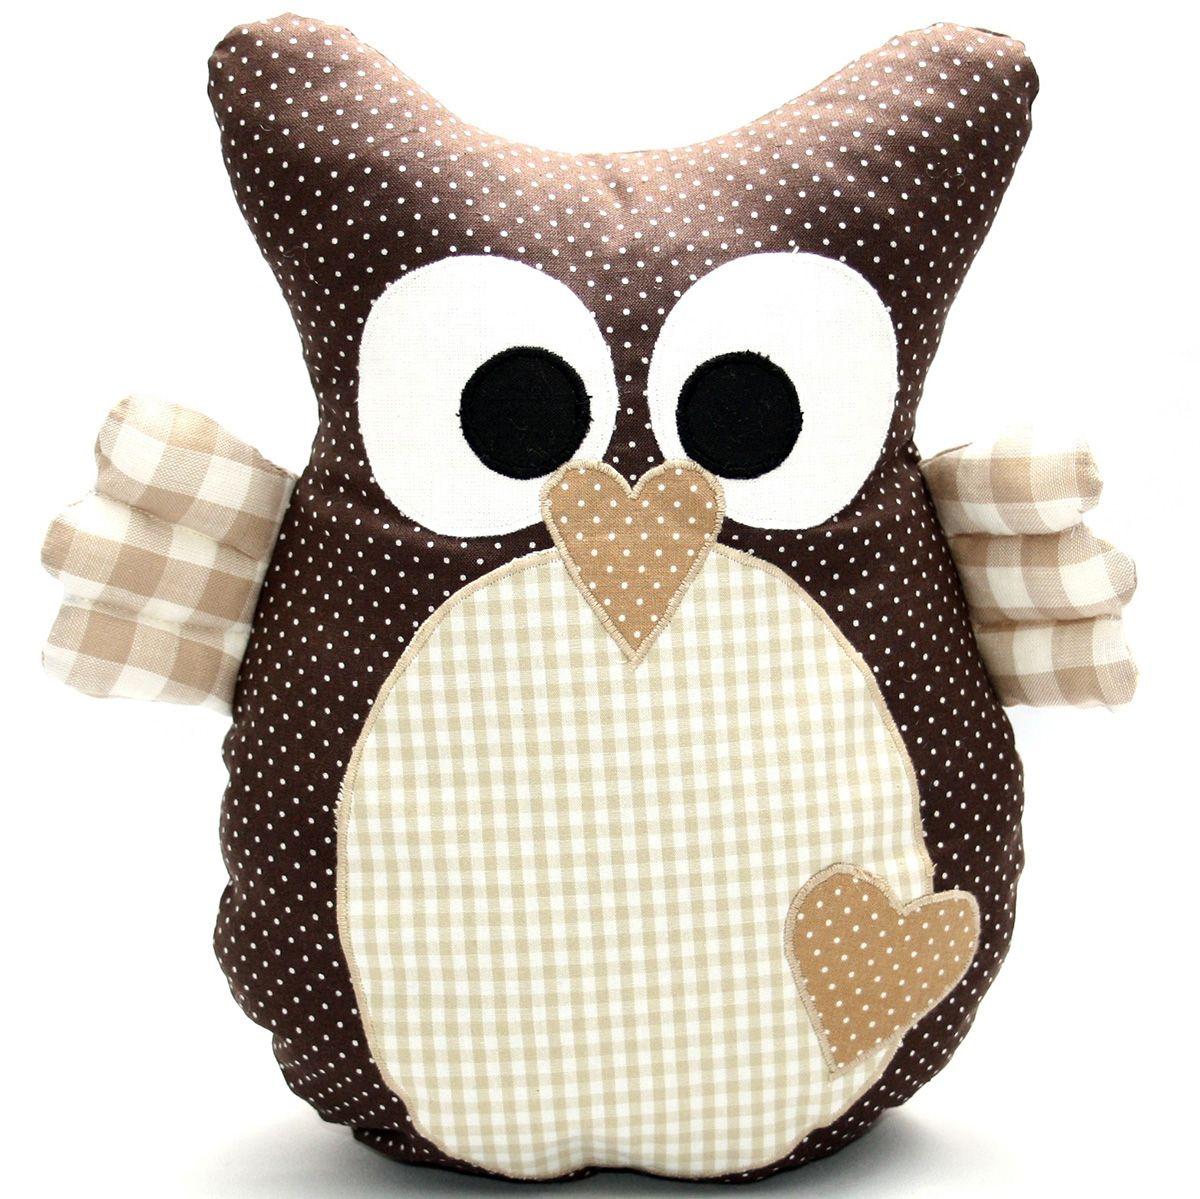 Eule Nähen Vorlage Kostenlos Google Search Nähen Owl Sewing